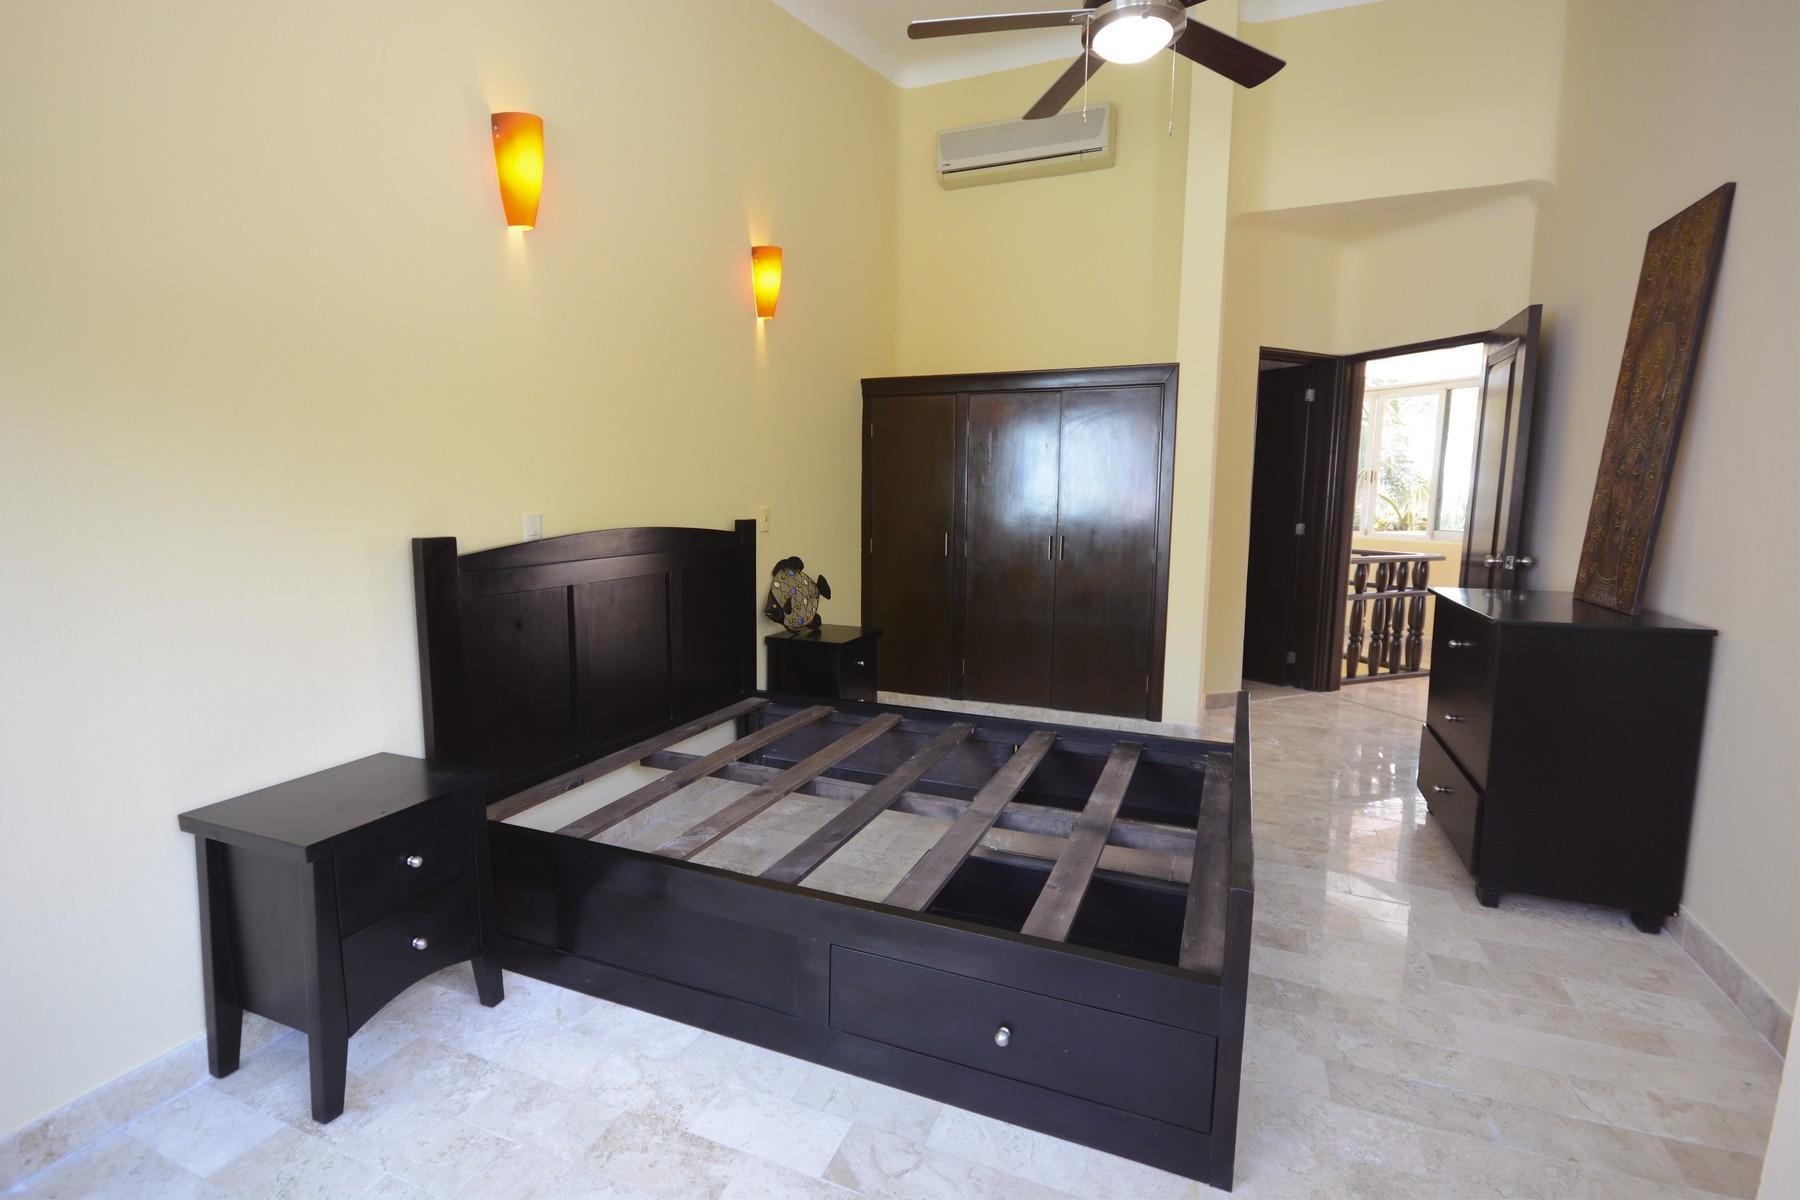 Additional photo for property listing at SOL VILLAGE Villa Del Sol SM-11 MZ-05 L-1 Puerto Morelos, Quintana Roo 77580 Mexico